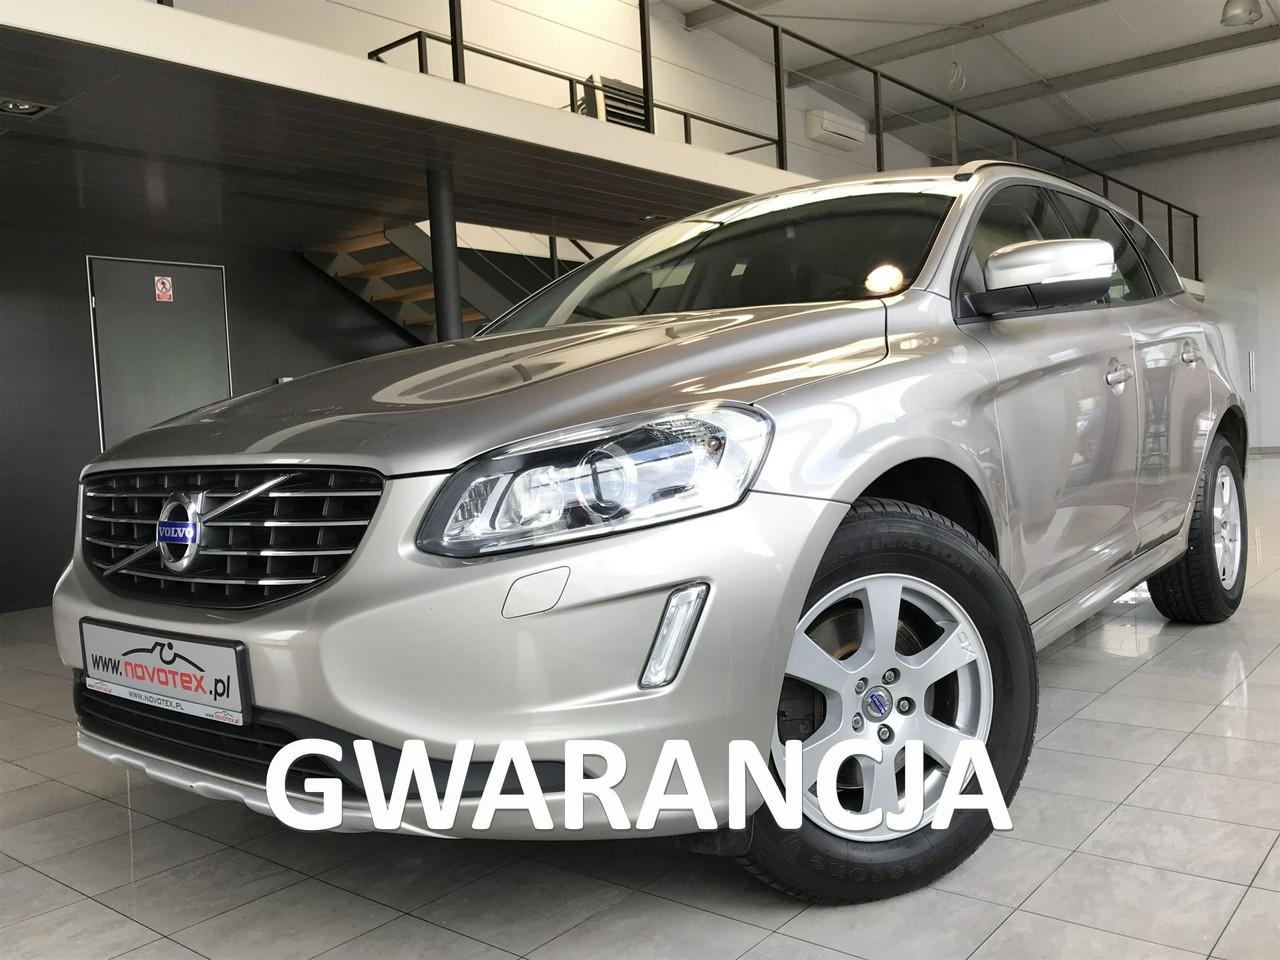 Volvo XC 60 D4*Momentum*xenon*navi*BLIS*nowe opony*serwis w ASO Volvo*gwarancjaVIP